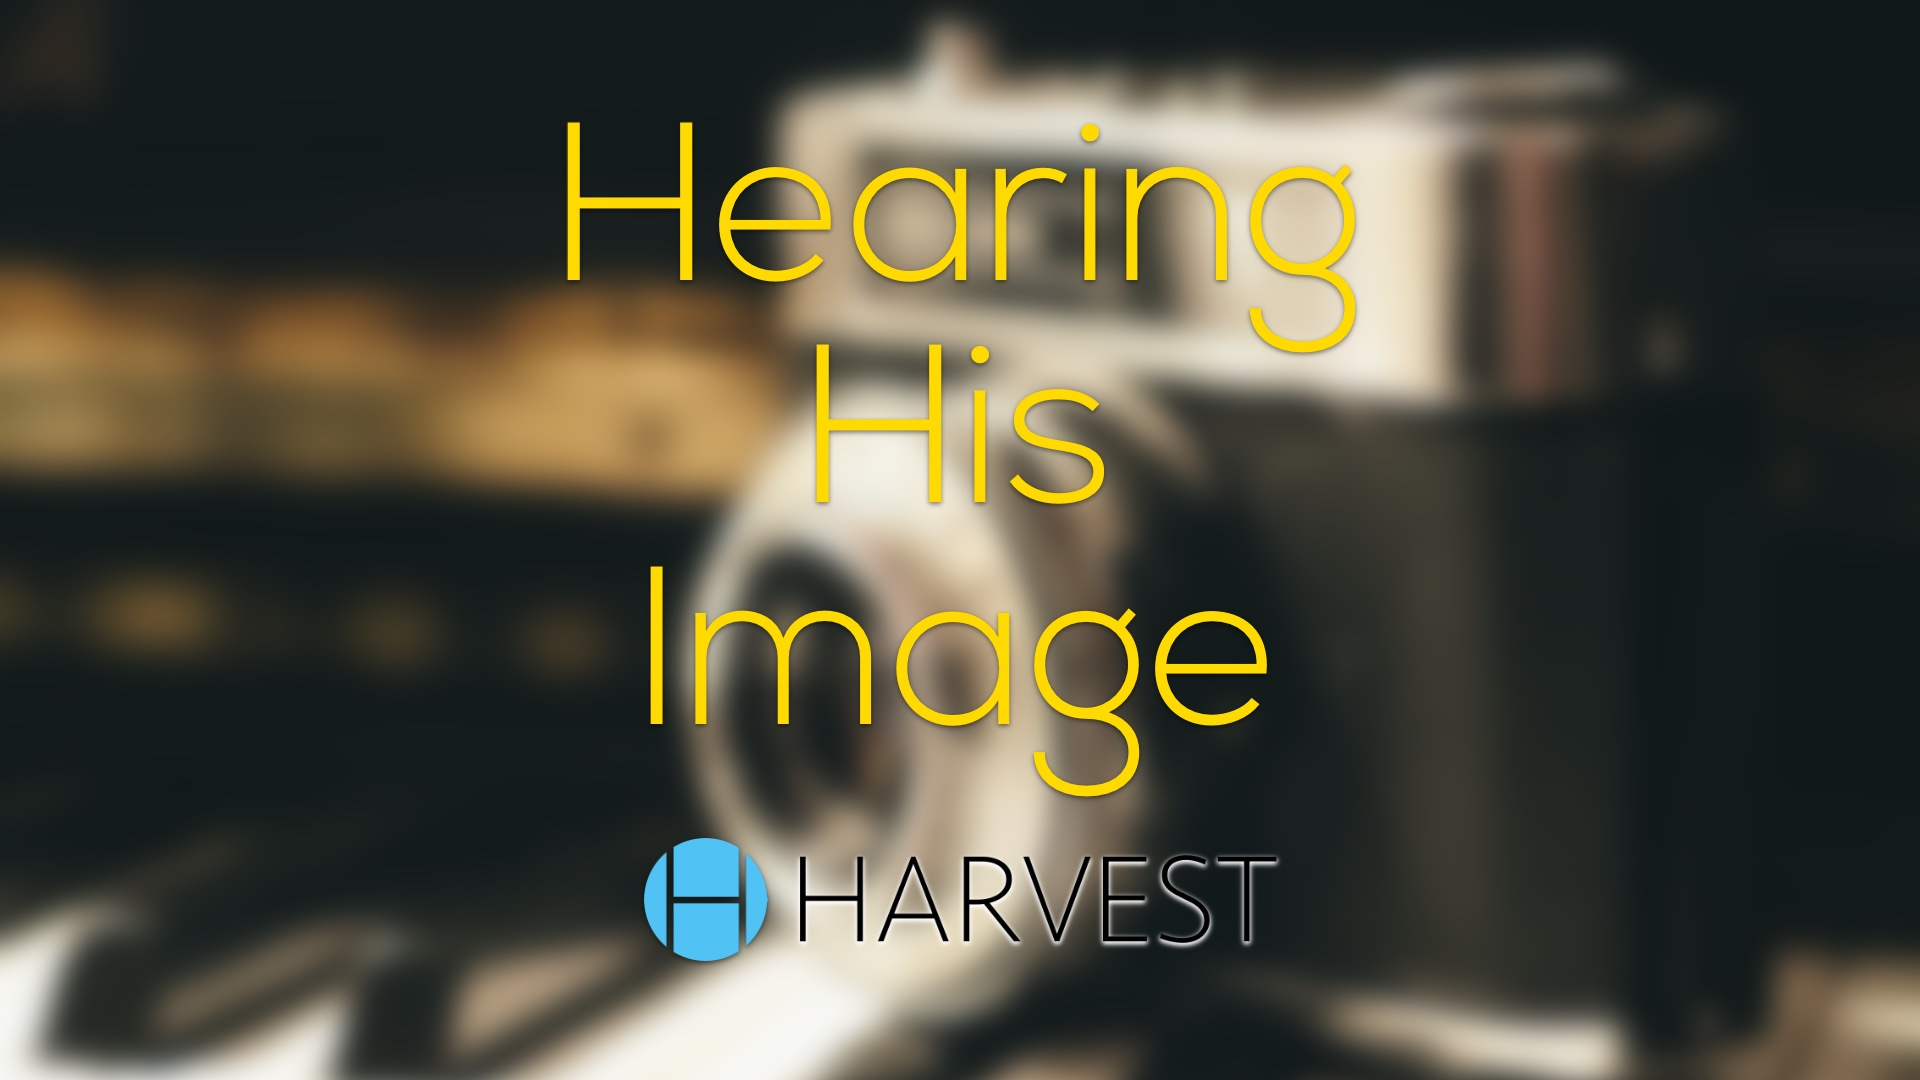 Hearing His Image